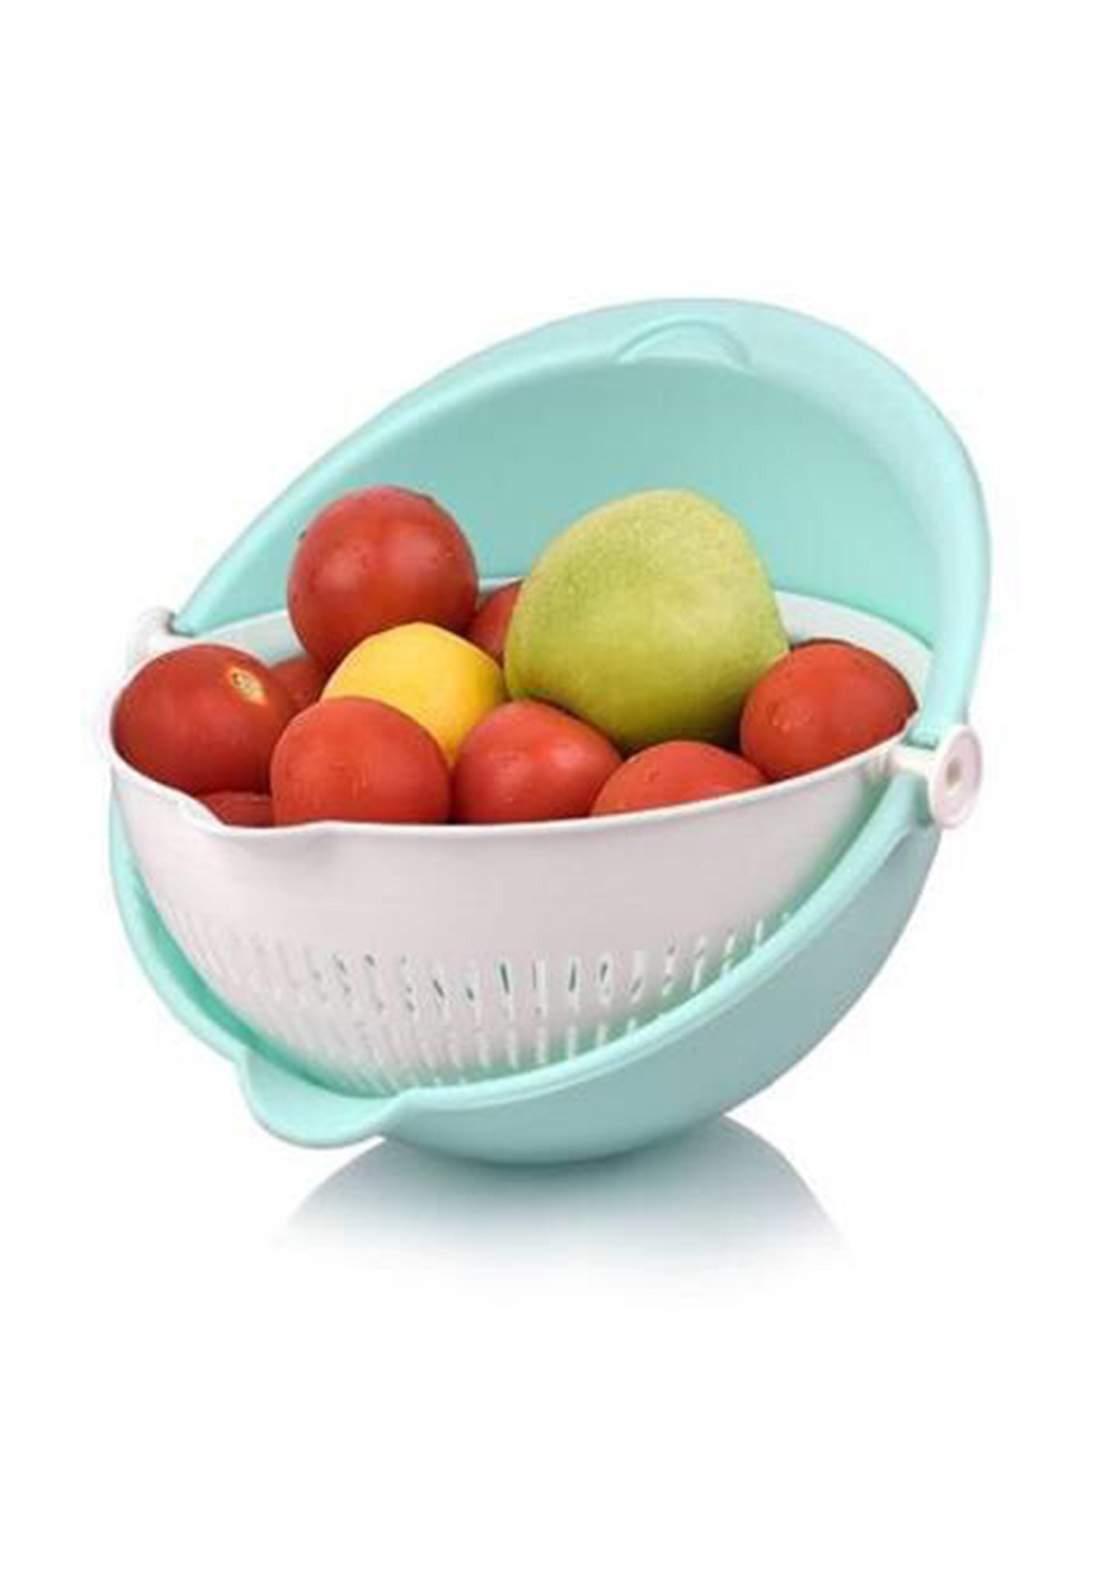 Hoppy Life Rotatry Round Vegetables Strainer مصفي متعدد الأستخدام